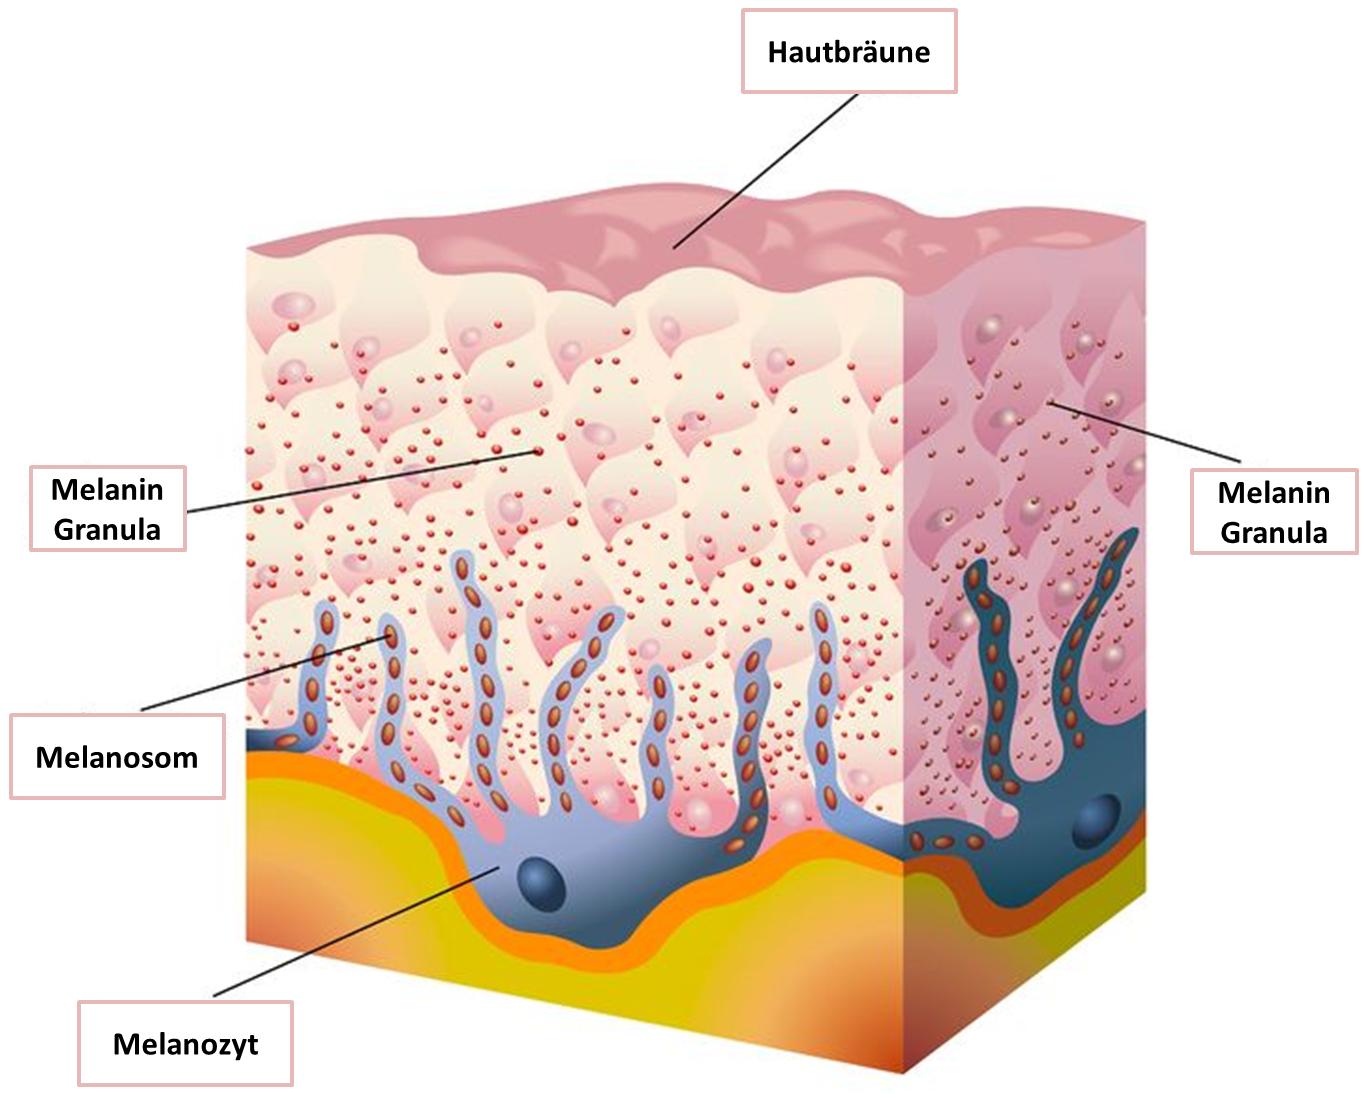 Pigmentstoerung/4 Melanozyten, Granulas und Braeune